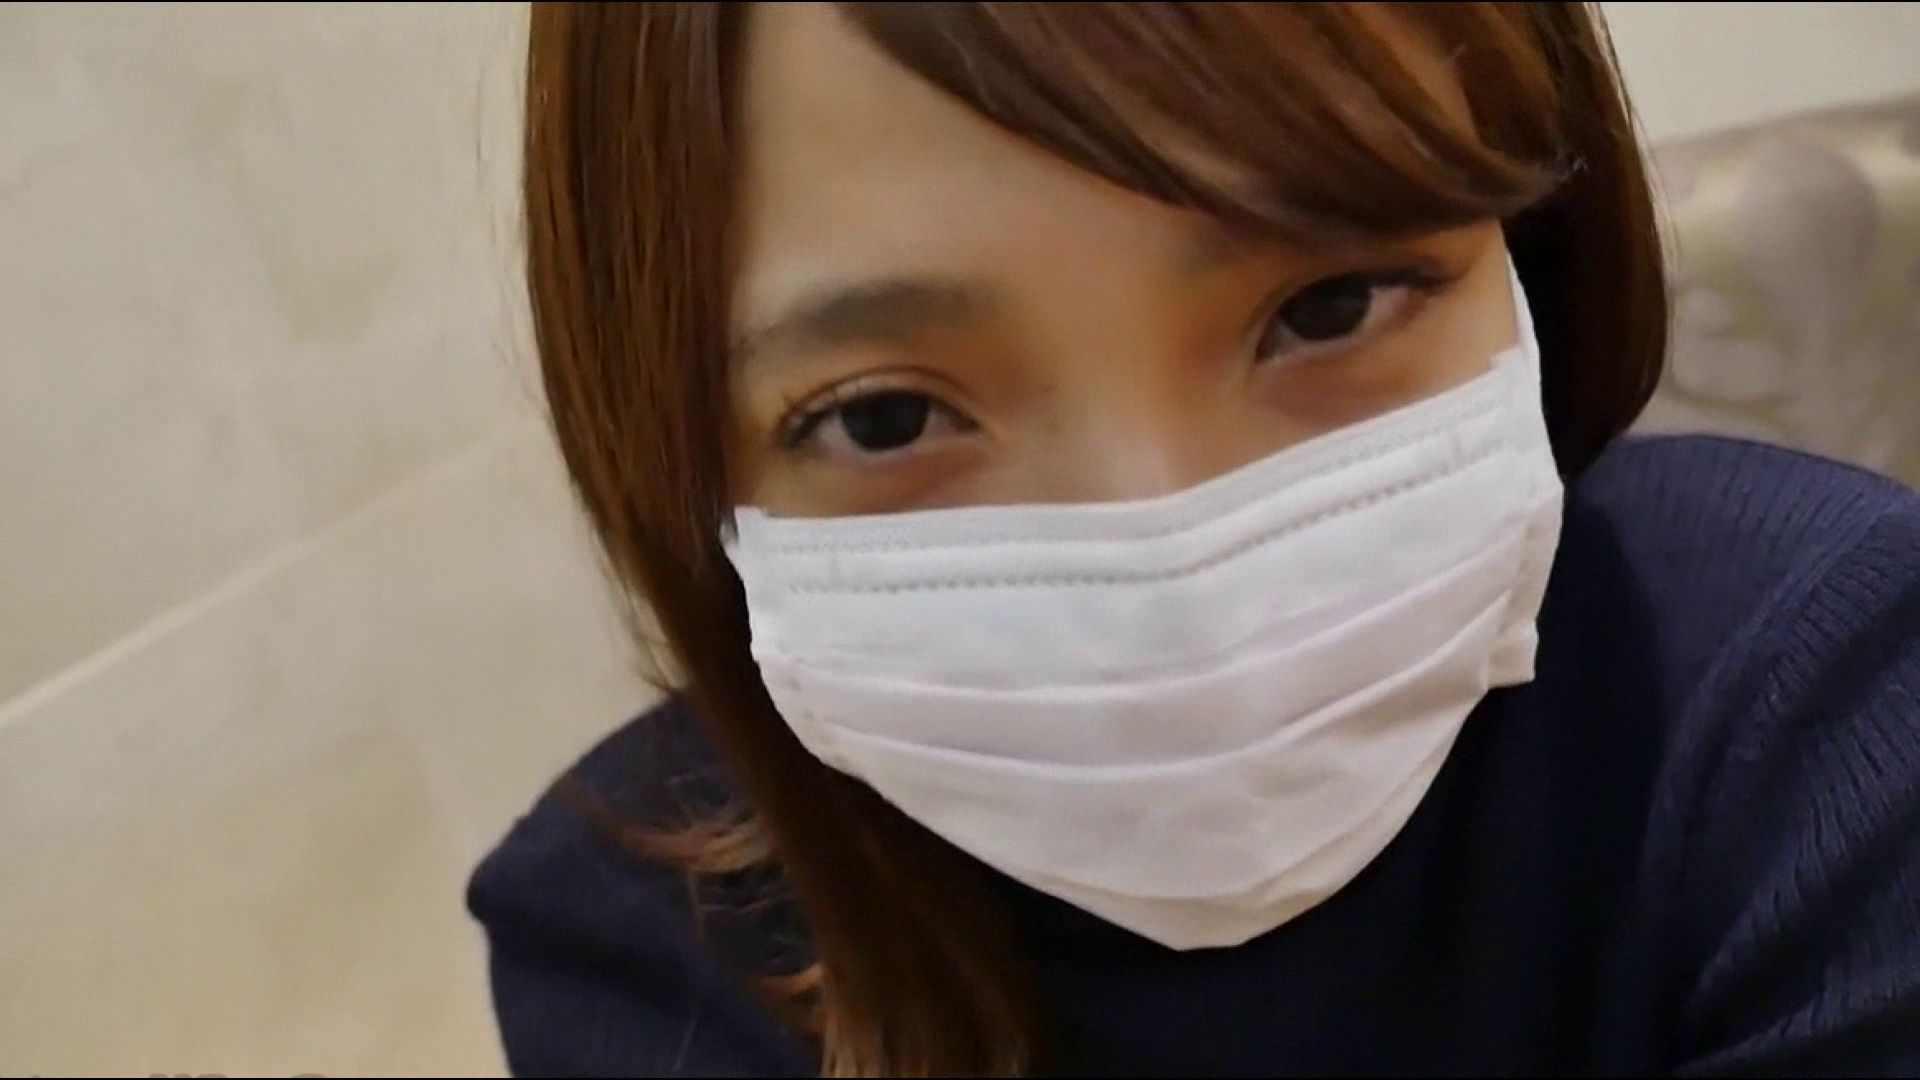 S級厳選美女ビッチガールVol.41 前編 美女  83pic 38